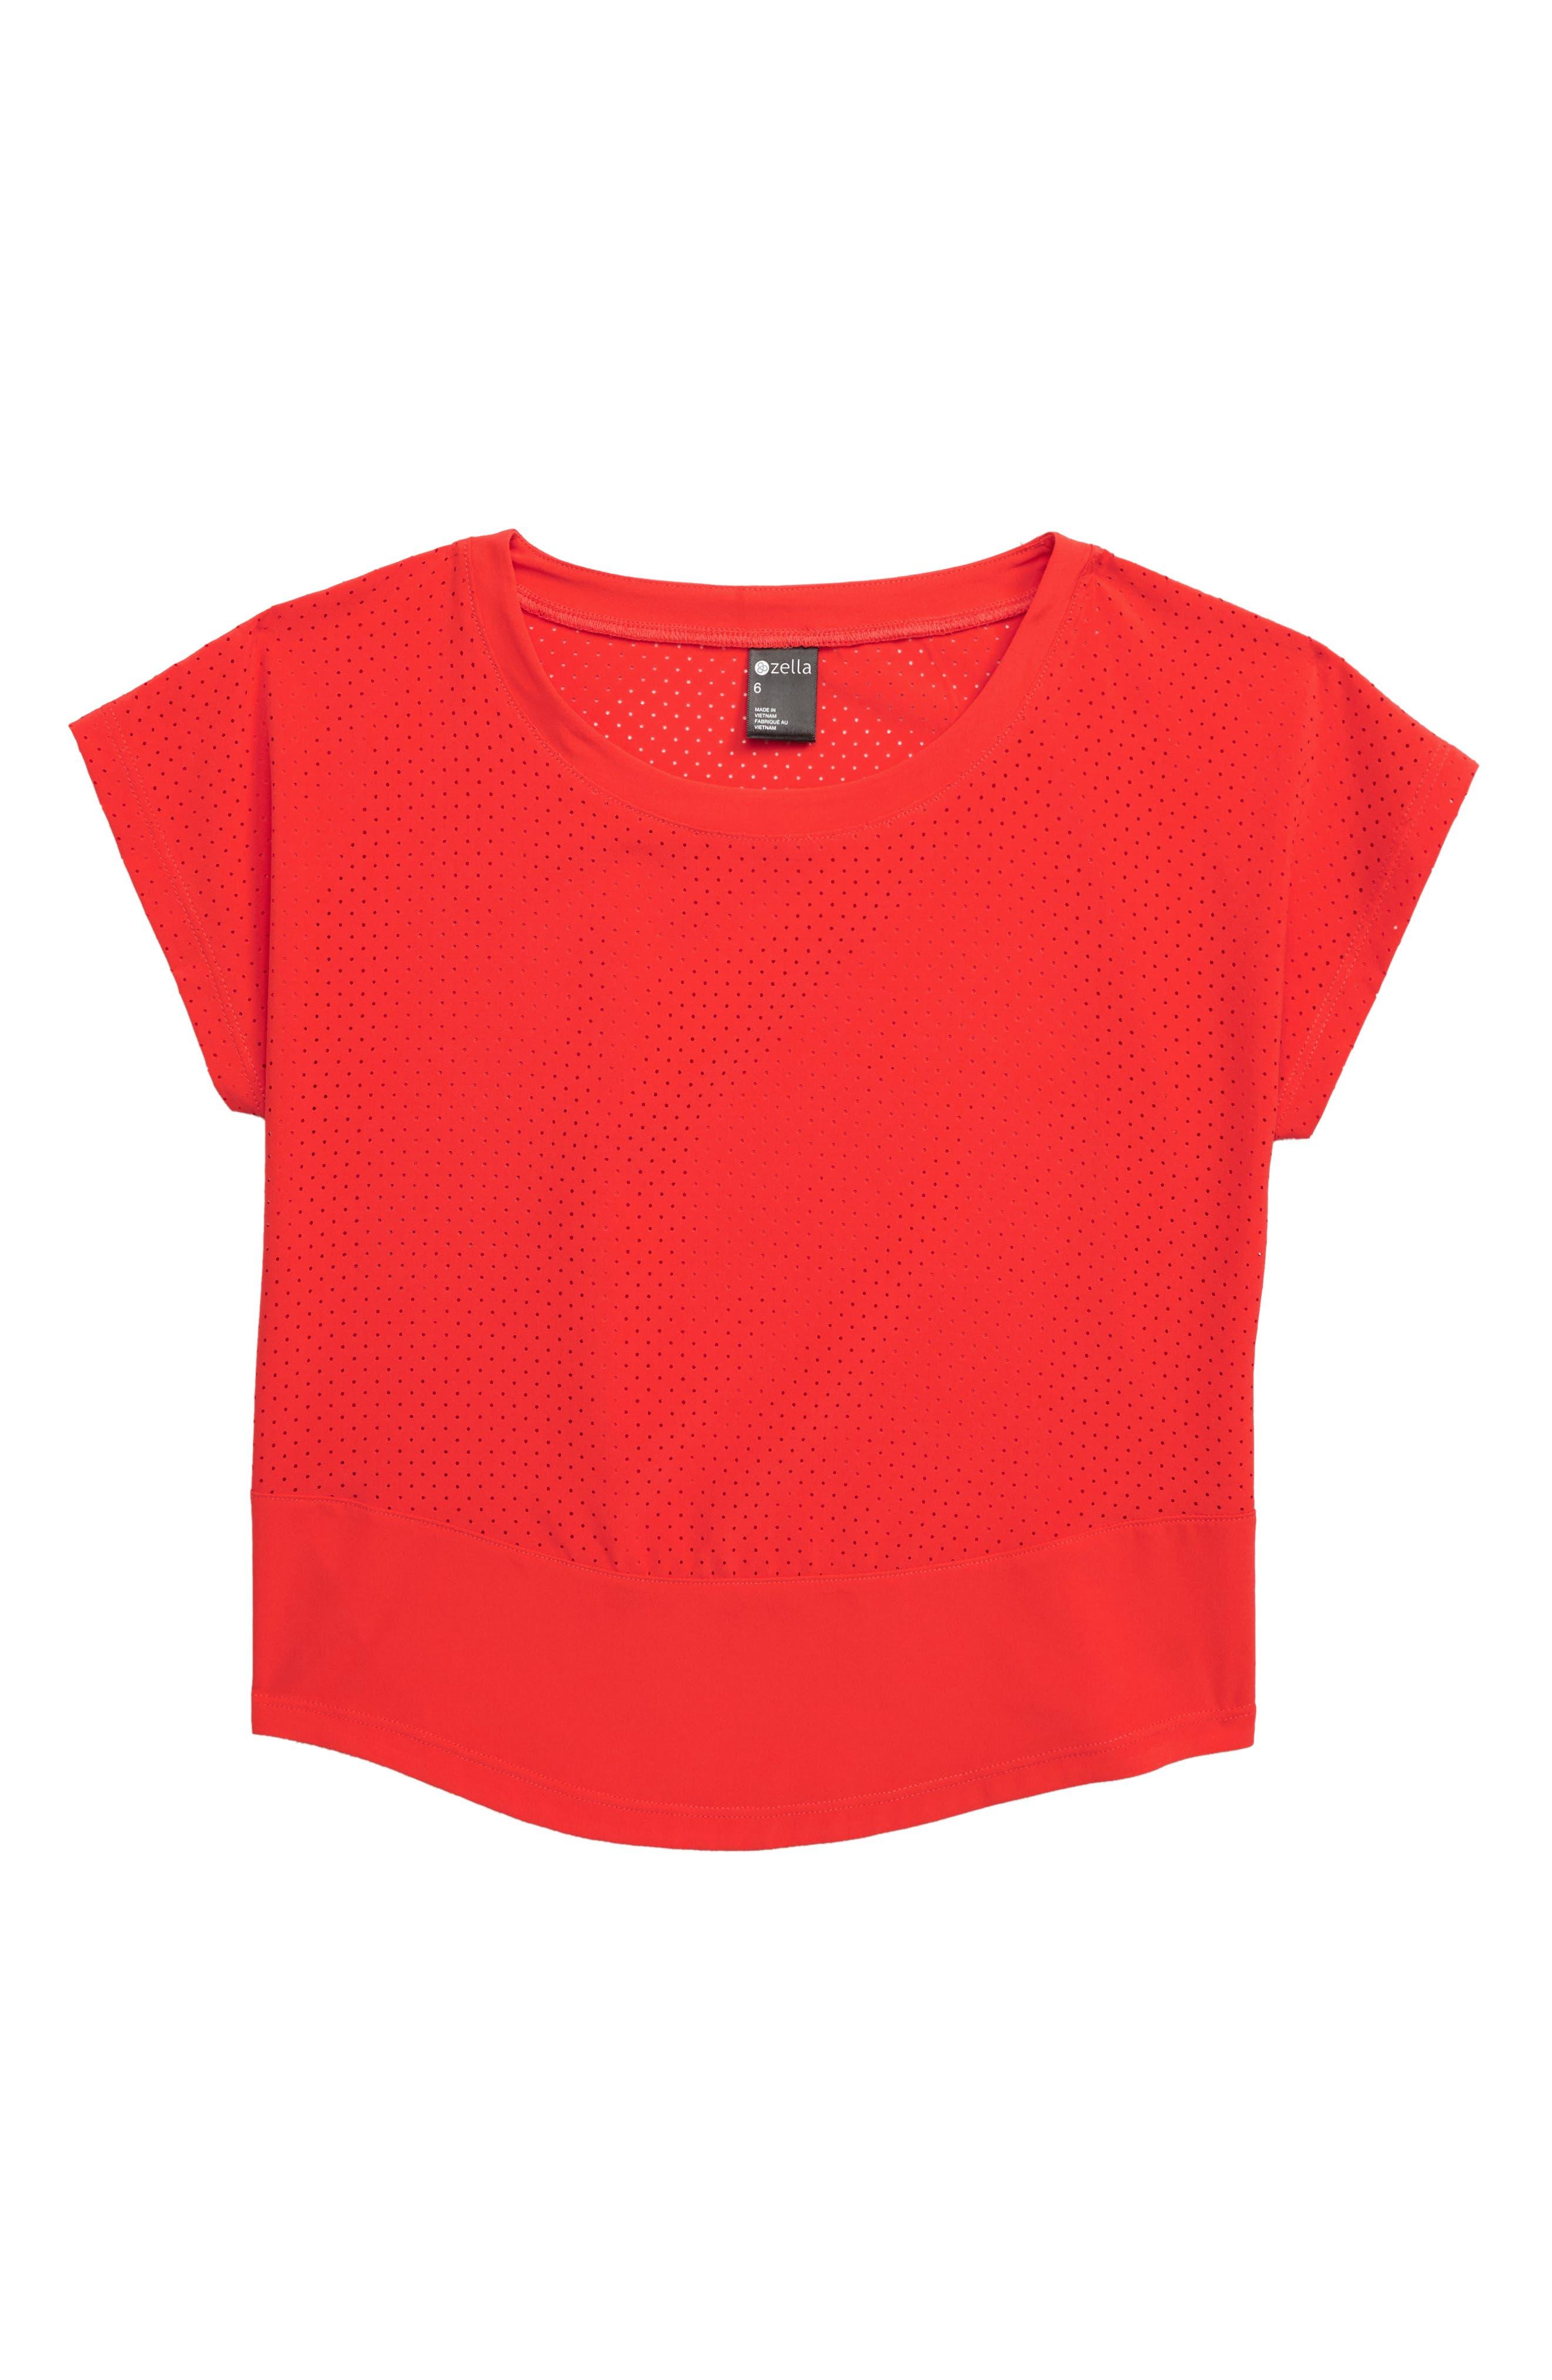 ZELLA GIRL, Perforated Shirt, Main thumbnail 1, color, RED POPPY